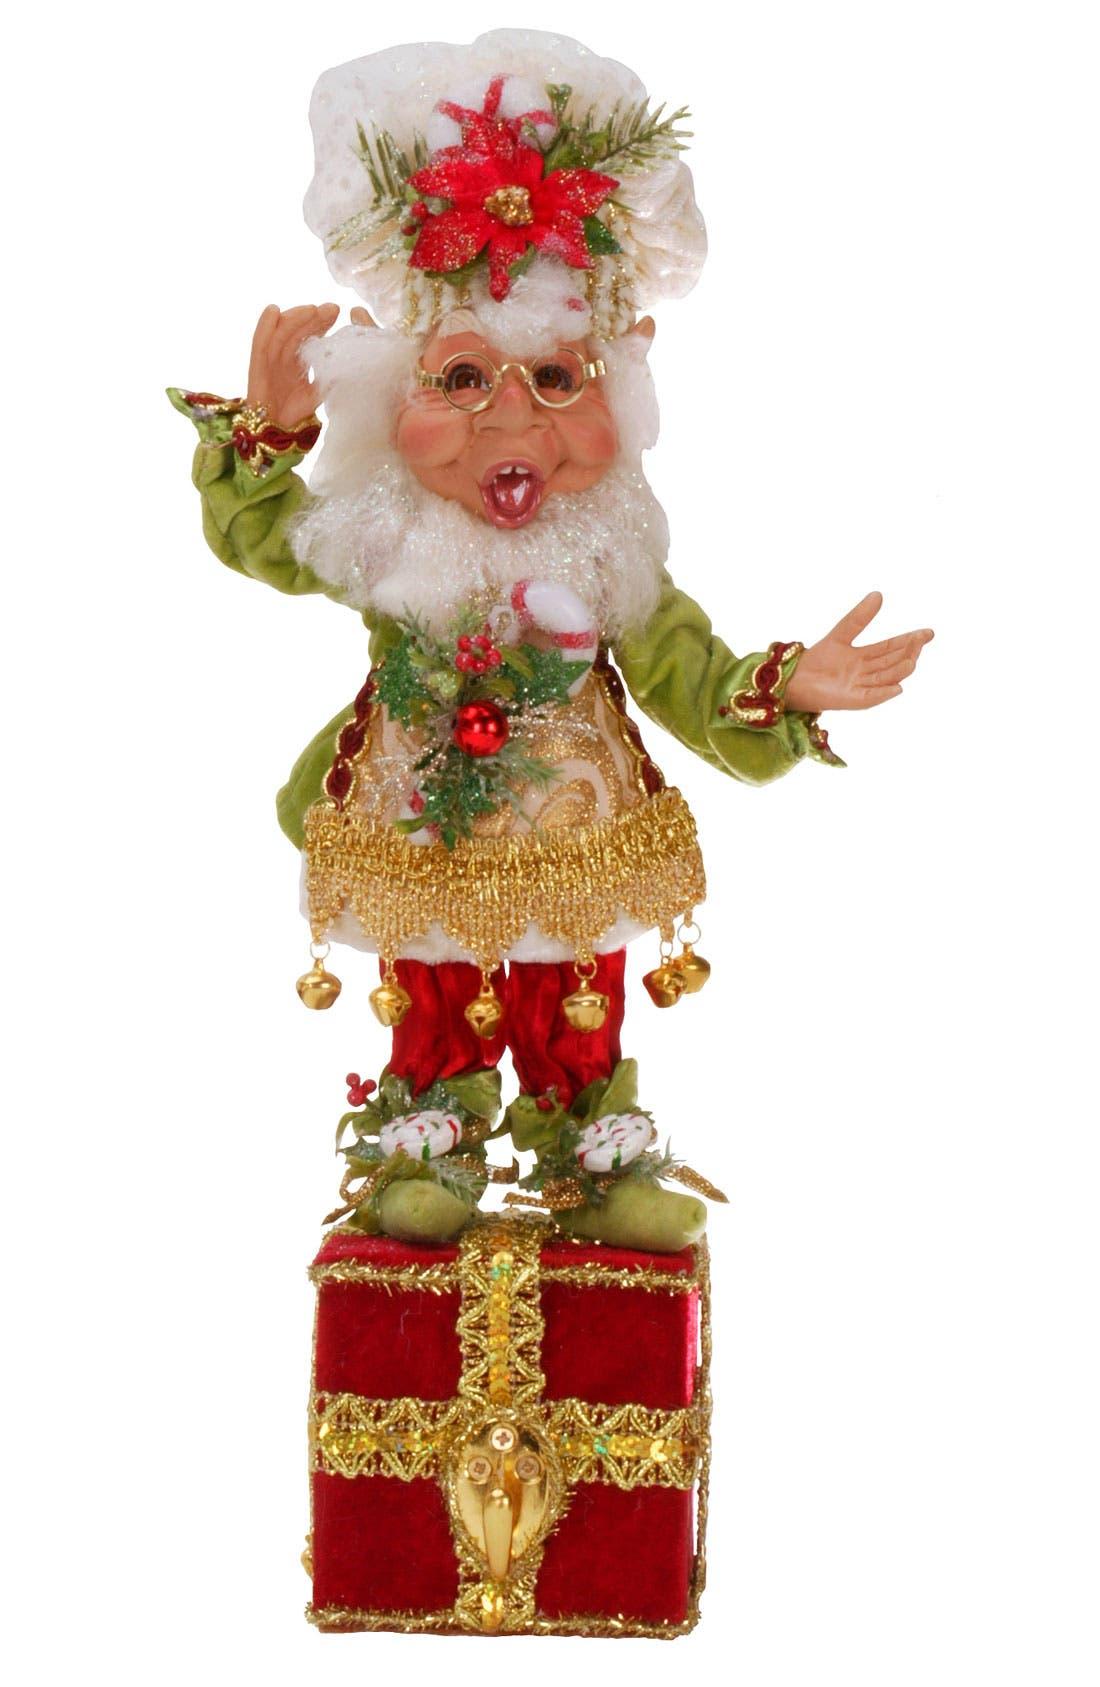 Alternate Image 1 Selected - Mark Roberts 'Sugar & Spice Elf' Stocking Holder (Limited Edition)